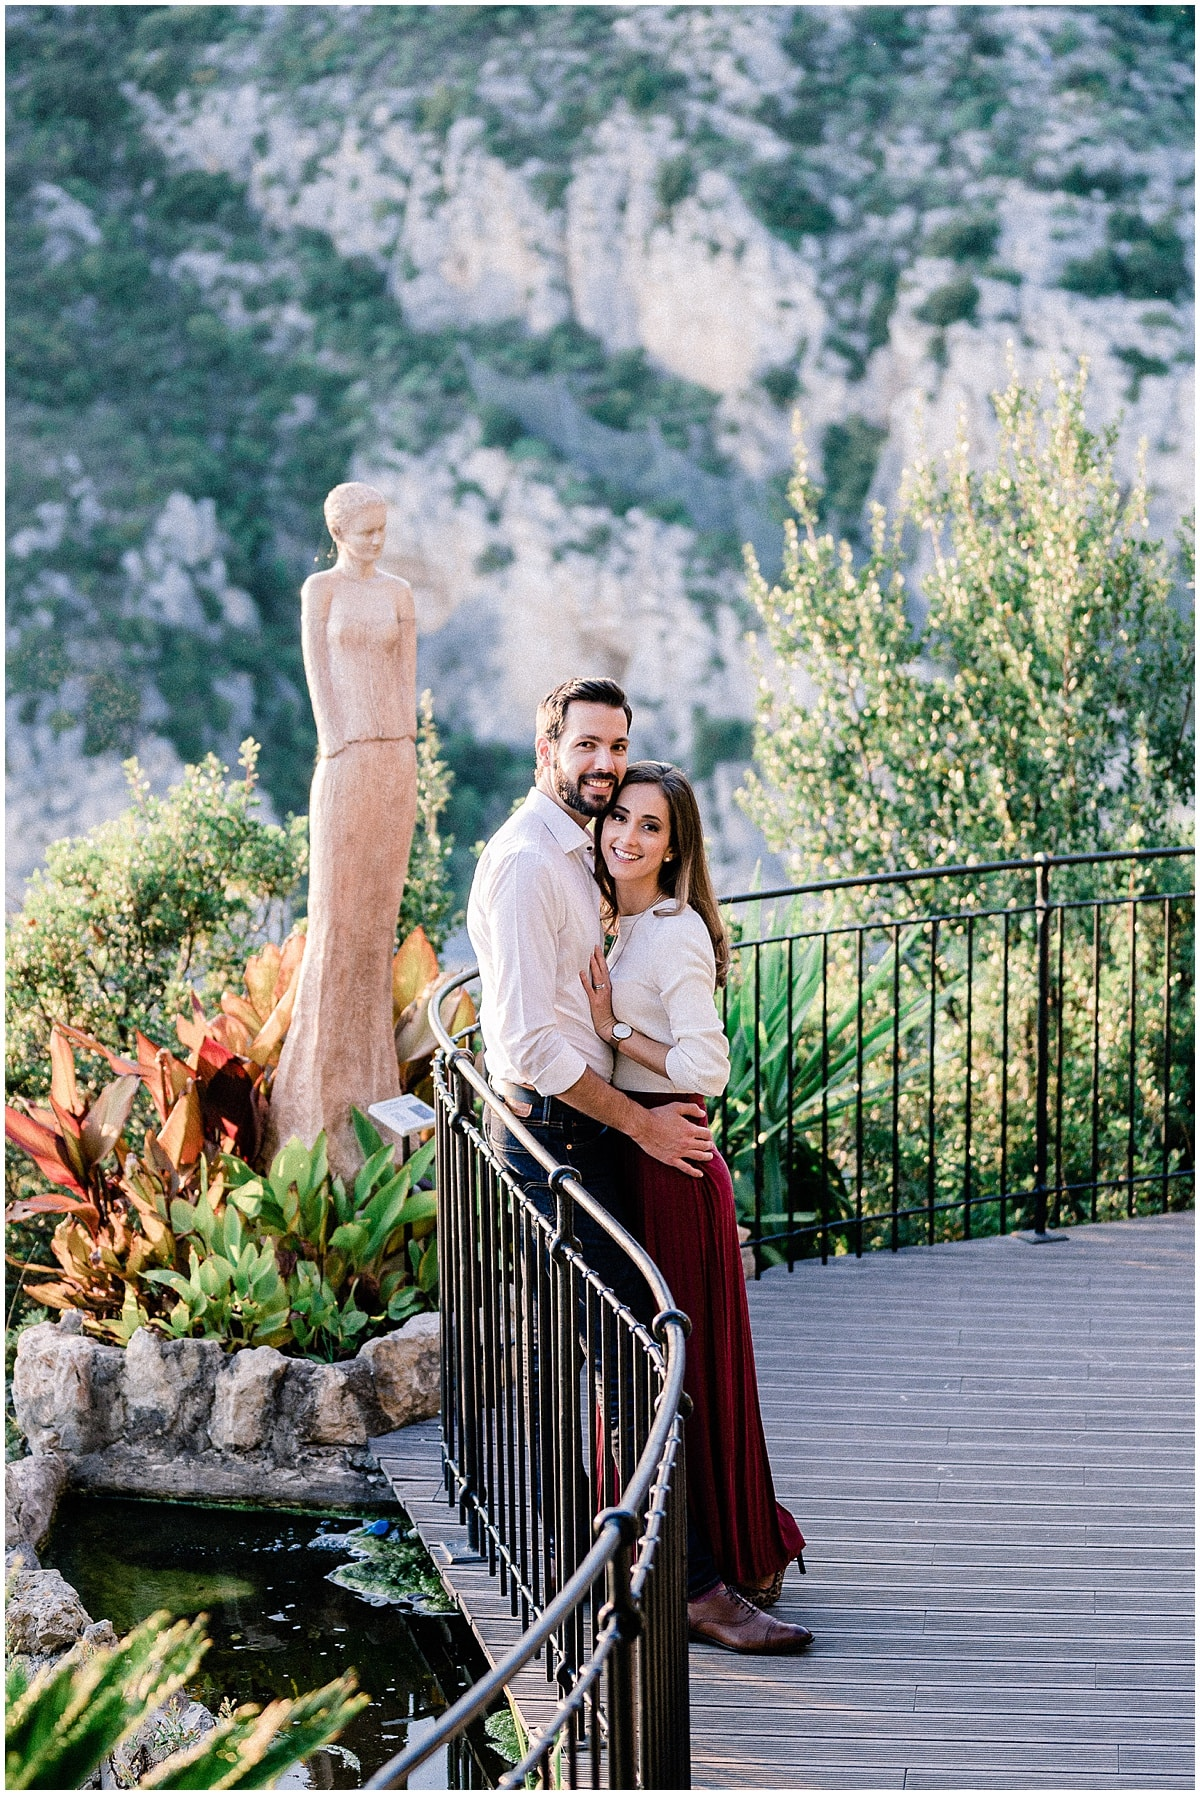 couple mariage photography Engagement photo Eze village french Riviera Photography